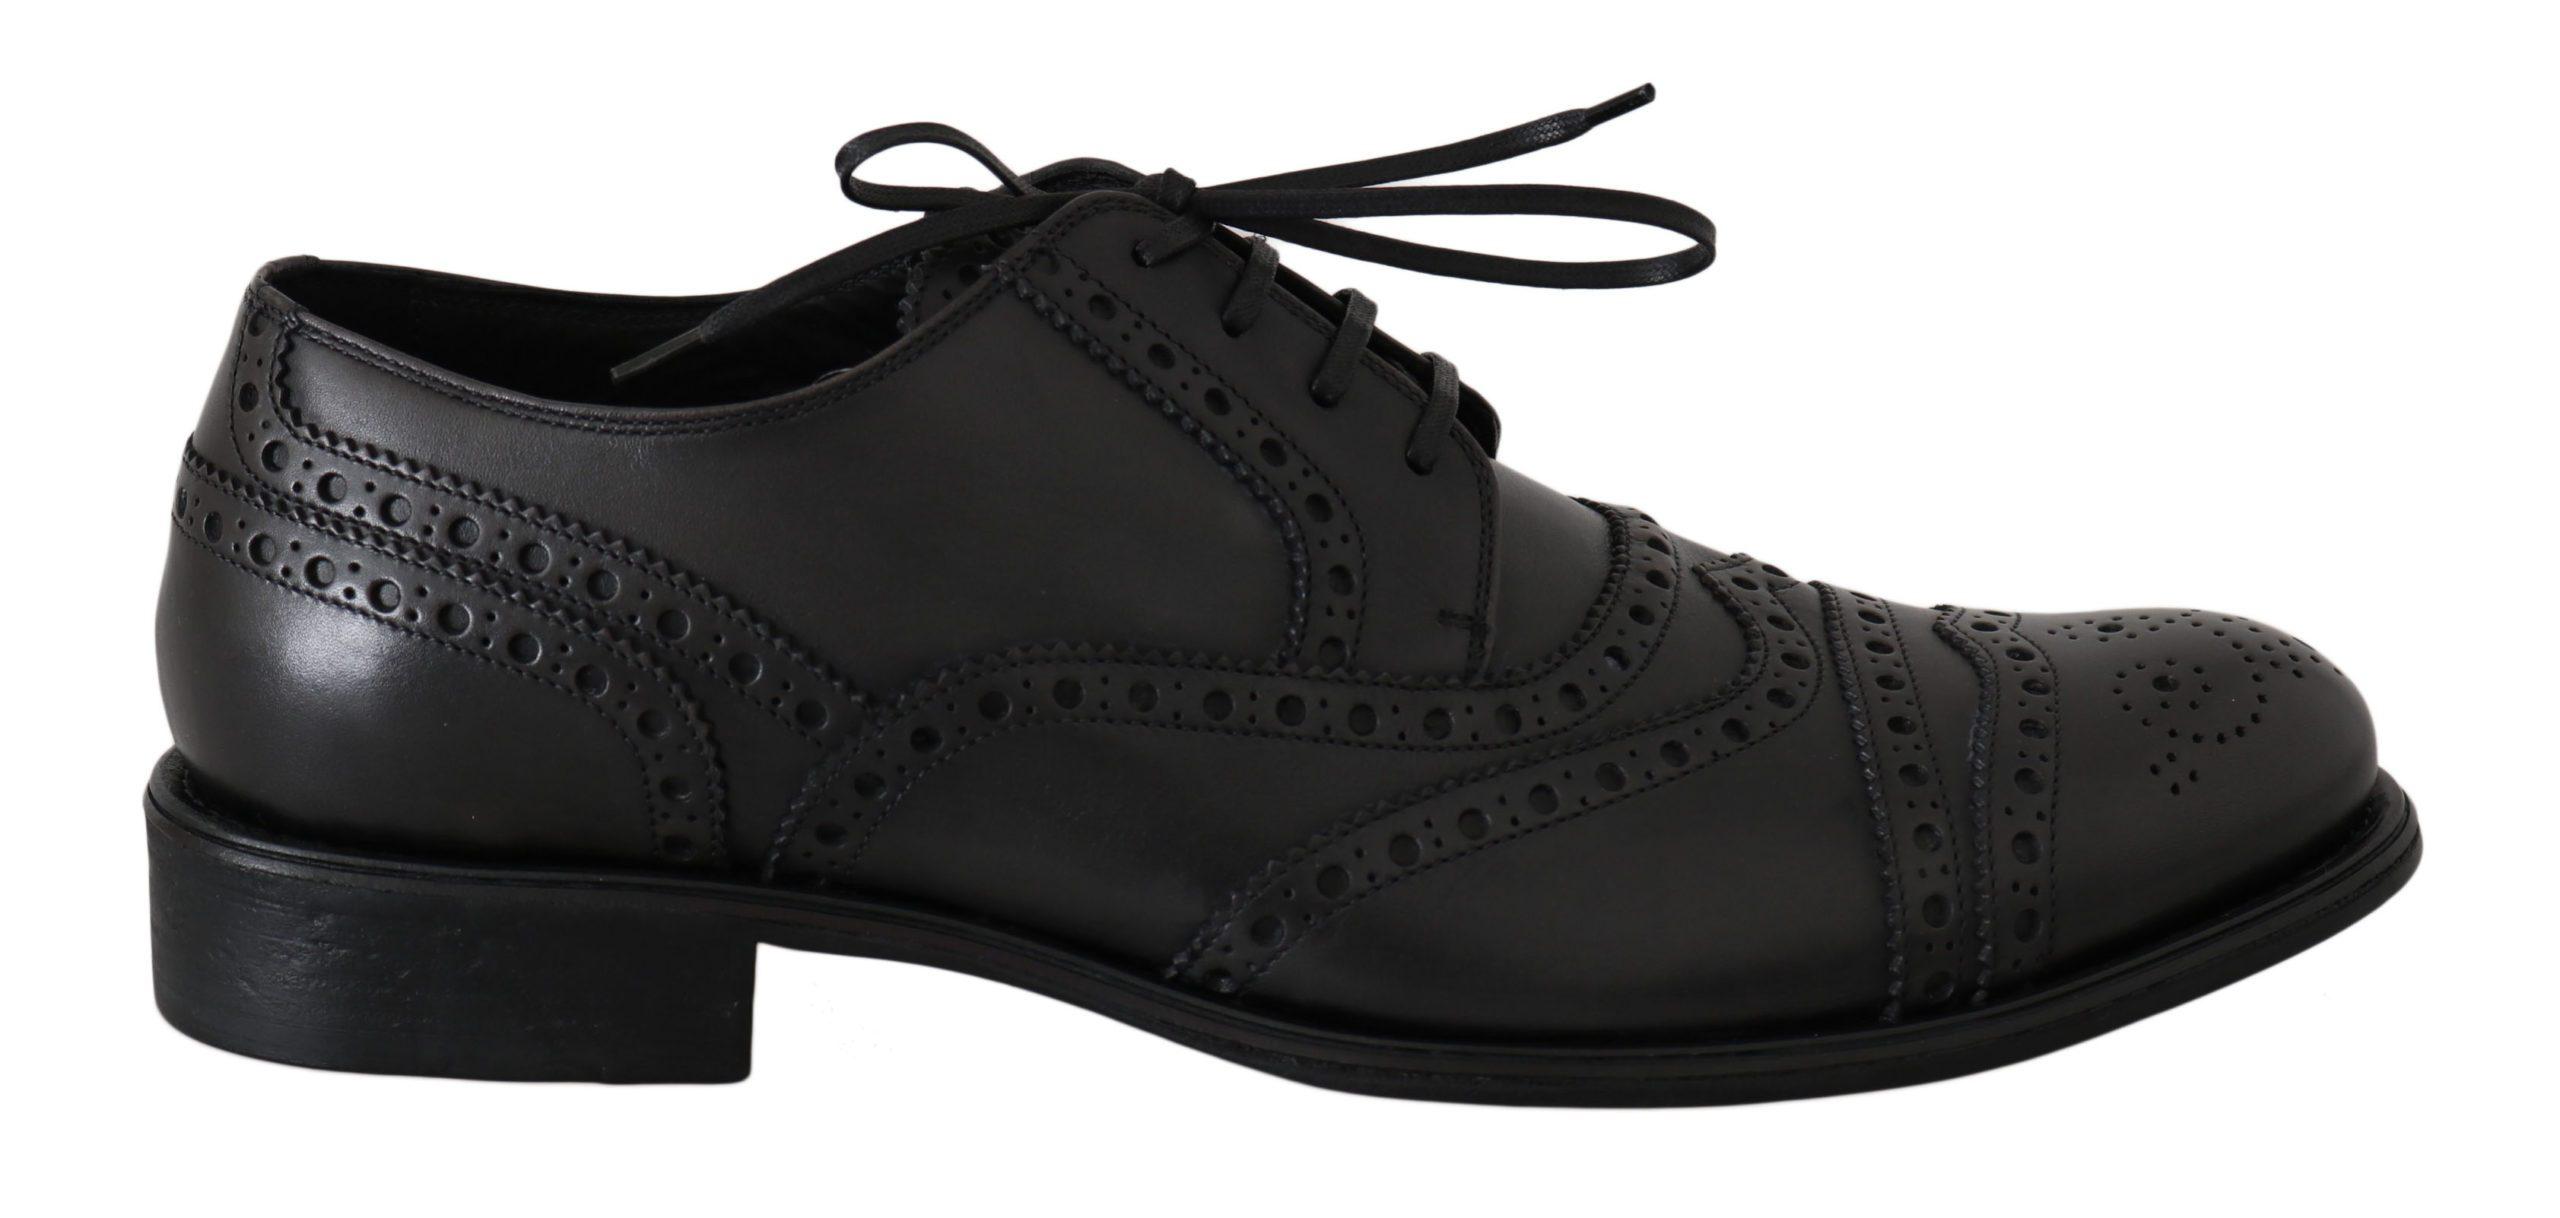 Dolce & Gabbana Men's Leather Wingtip Formal Derby Shoes Gray MV2357 - EU42.5/US9.5